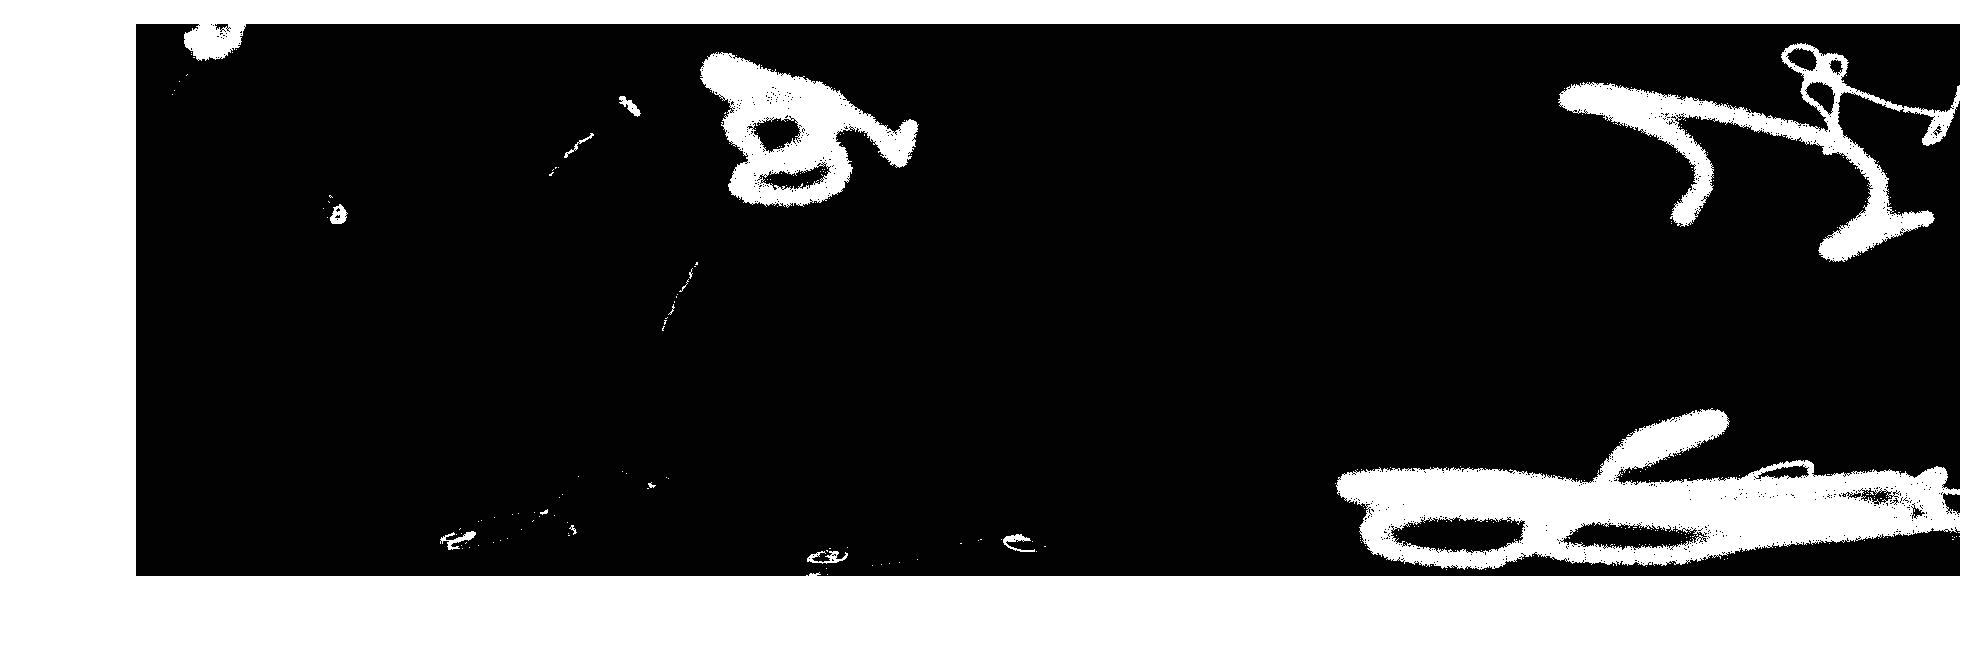 Awareness Gallery's Signature